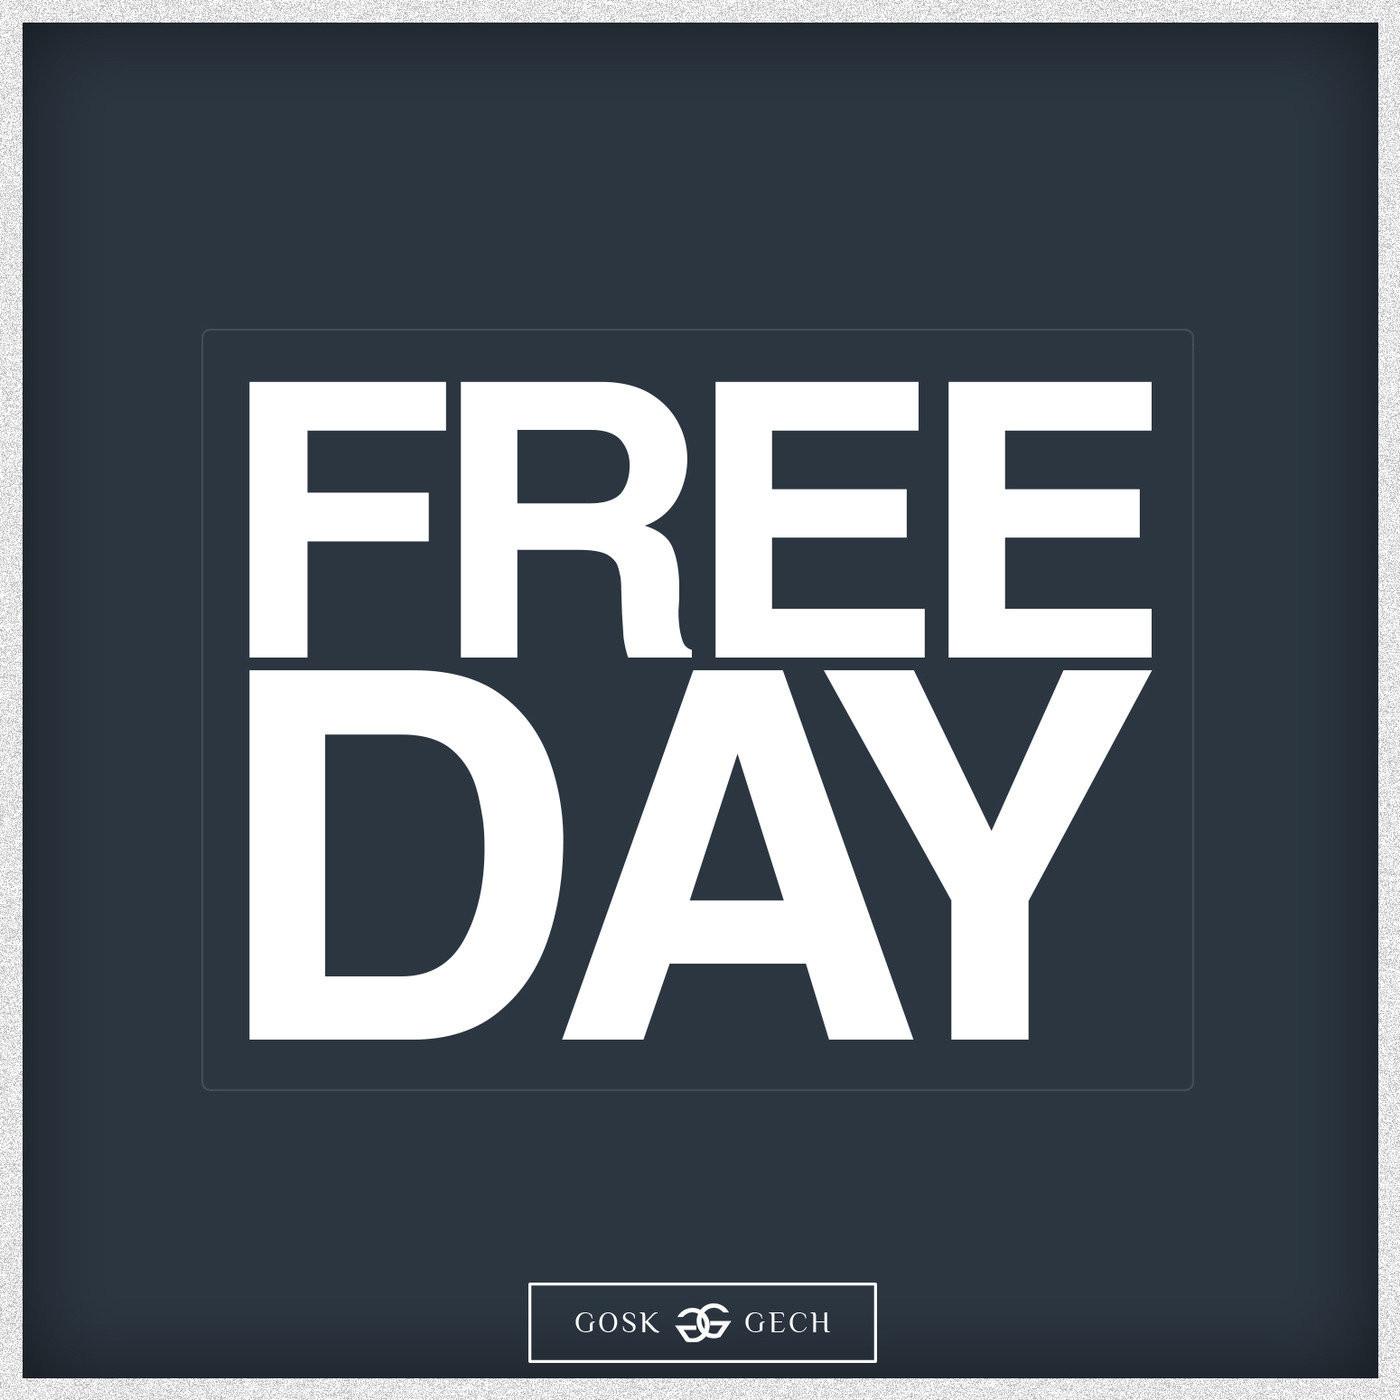 <![CDATA[FREEDAY]]>